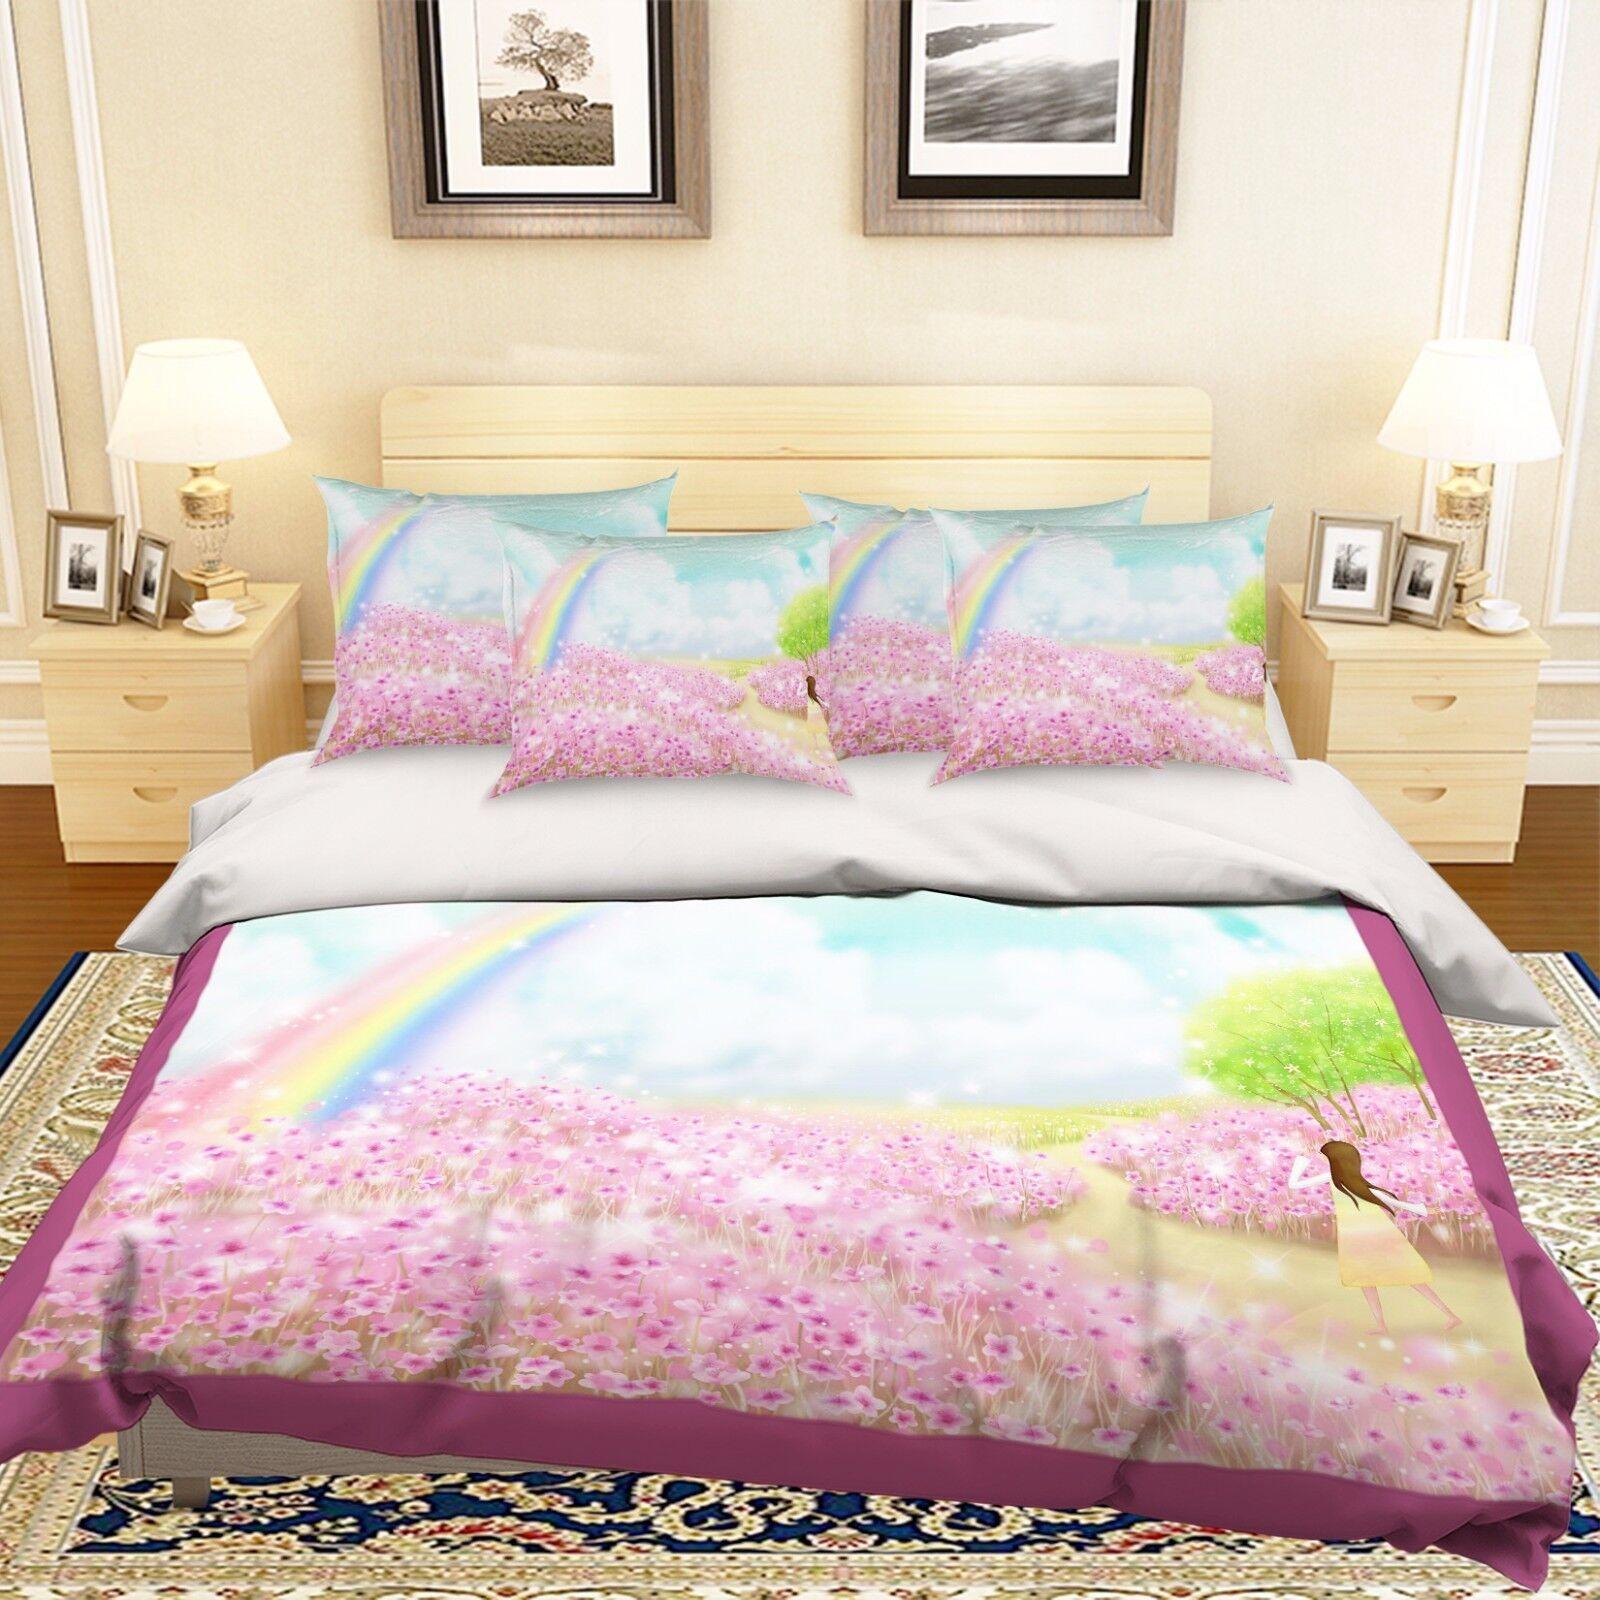 3D Rainbow Sky 896 Bett Pillowcases Quilt Duvet Startseite Set Single Königin UK Summer